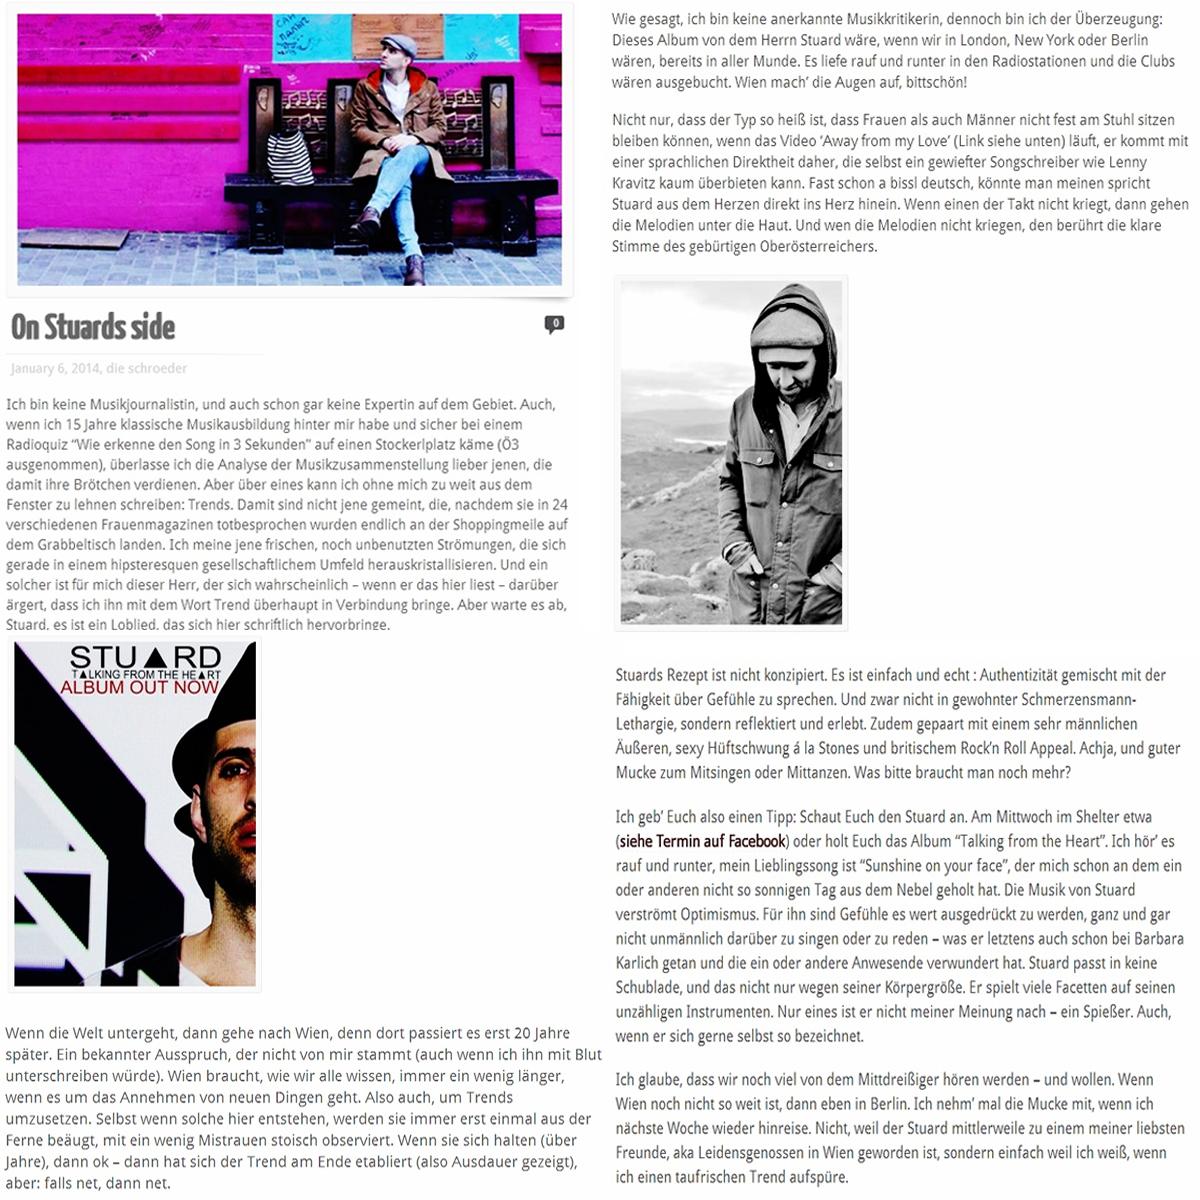 STU▲RD INTERVIEW DieSchröder 06.01.2014.